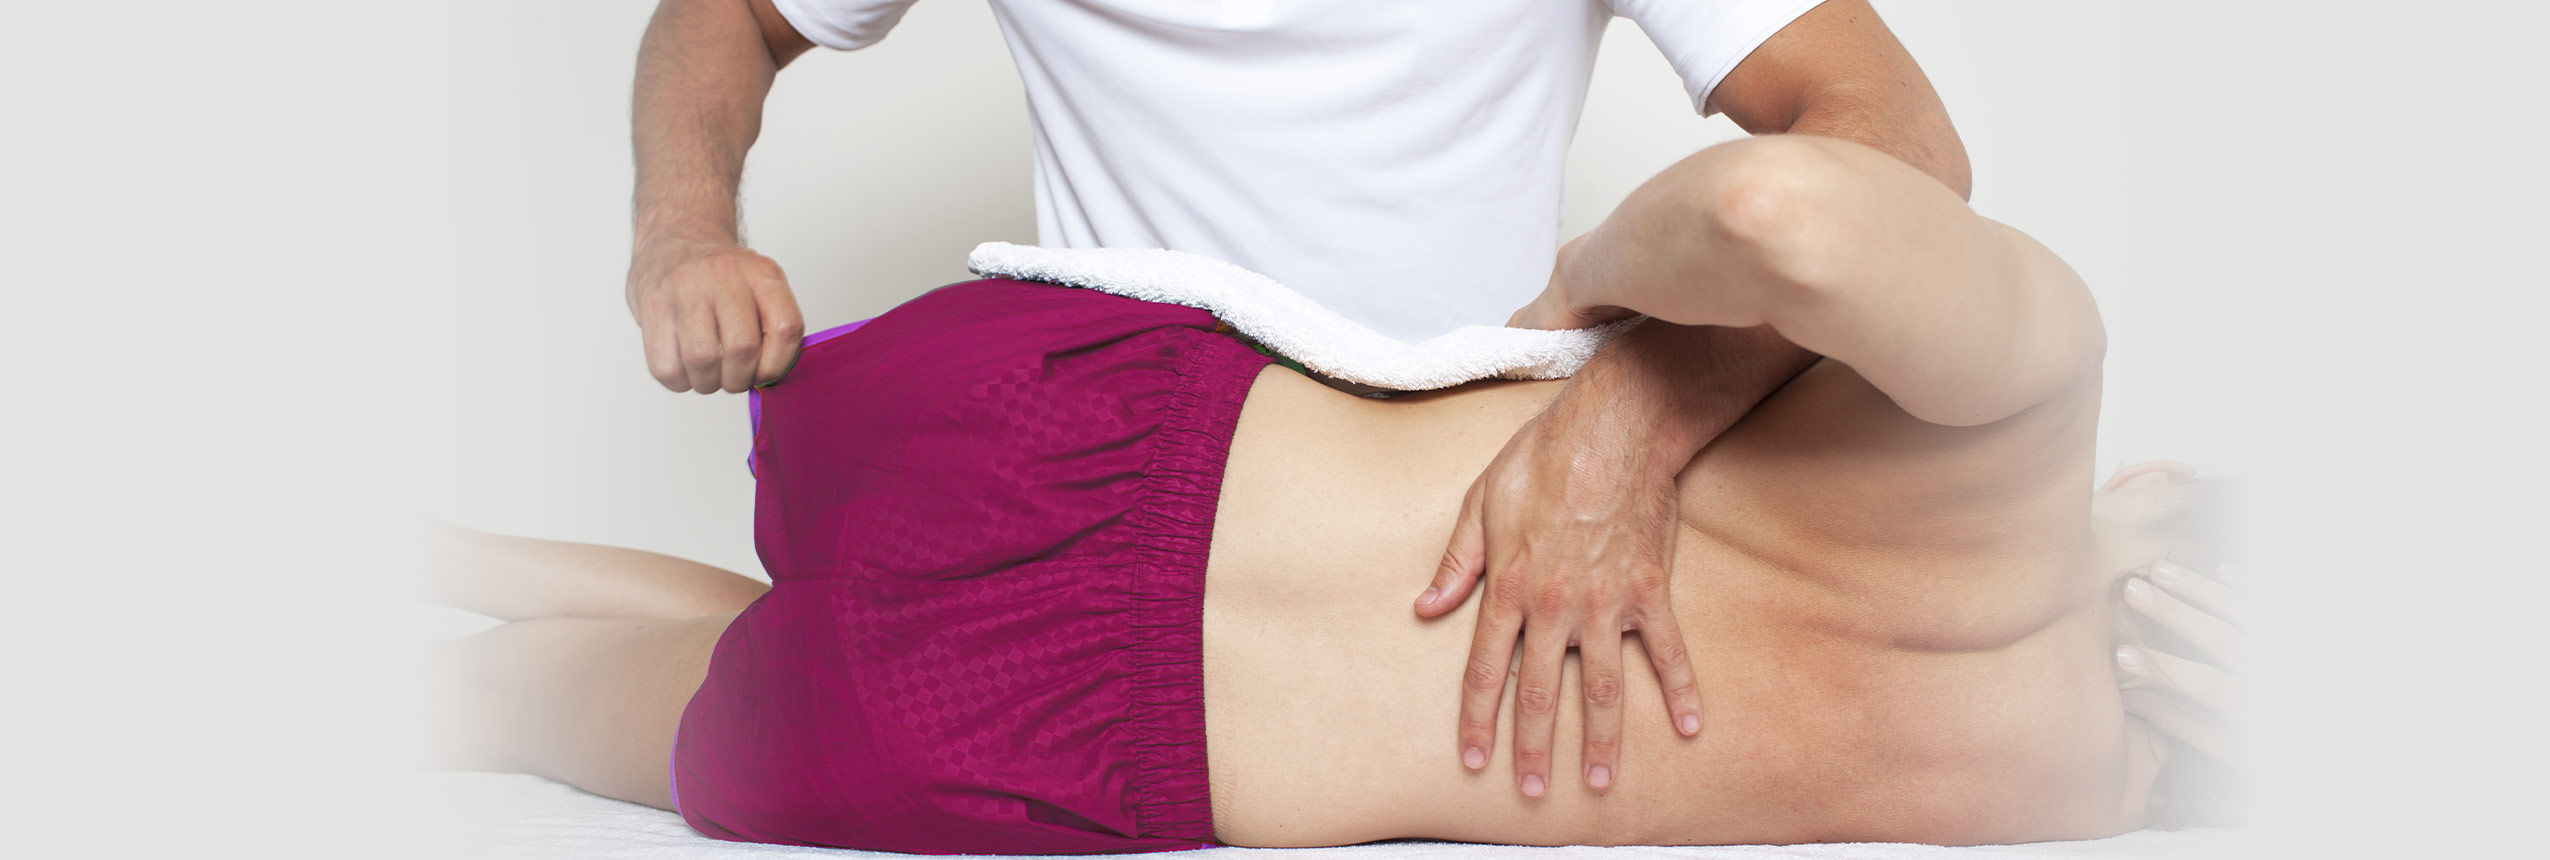 chirotherapie muenchen orthopaede - Chirotherapie